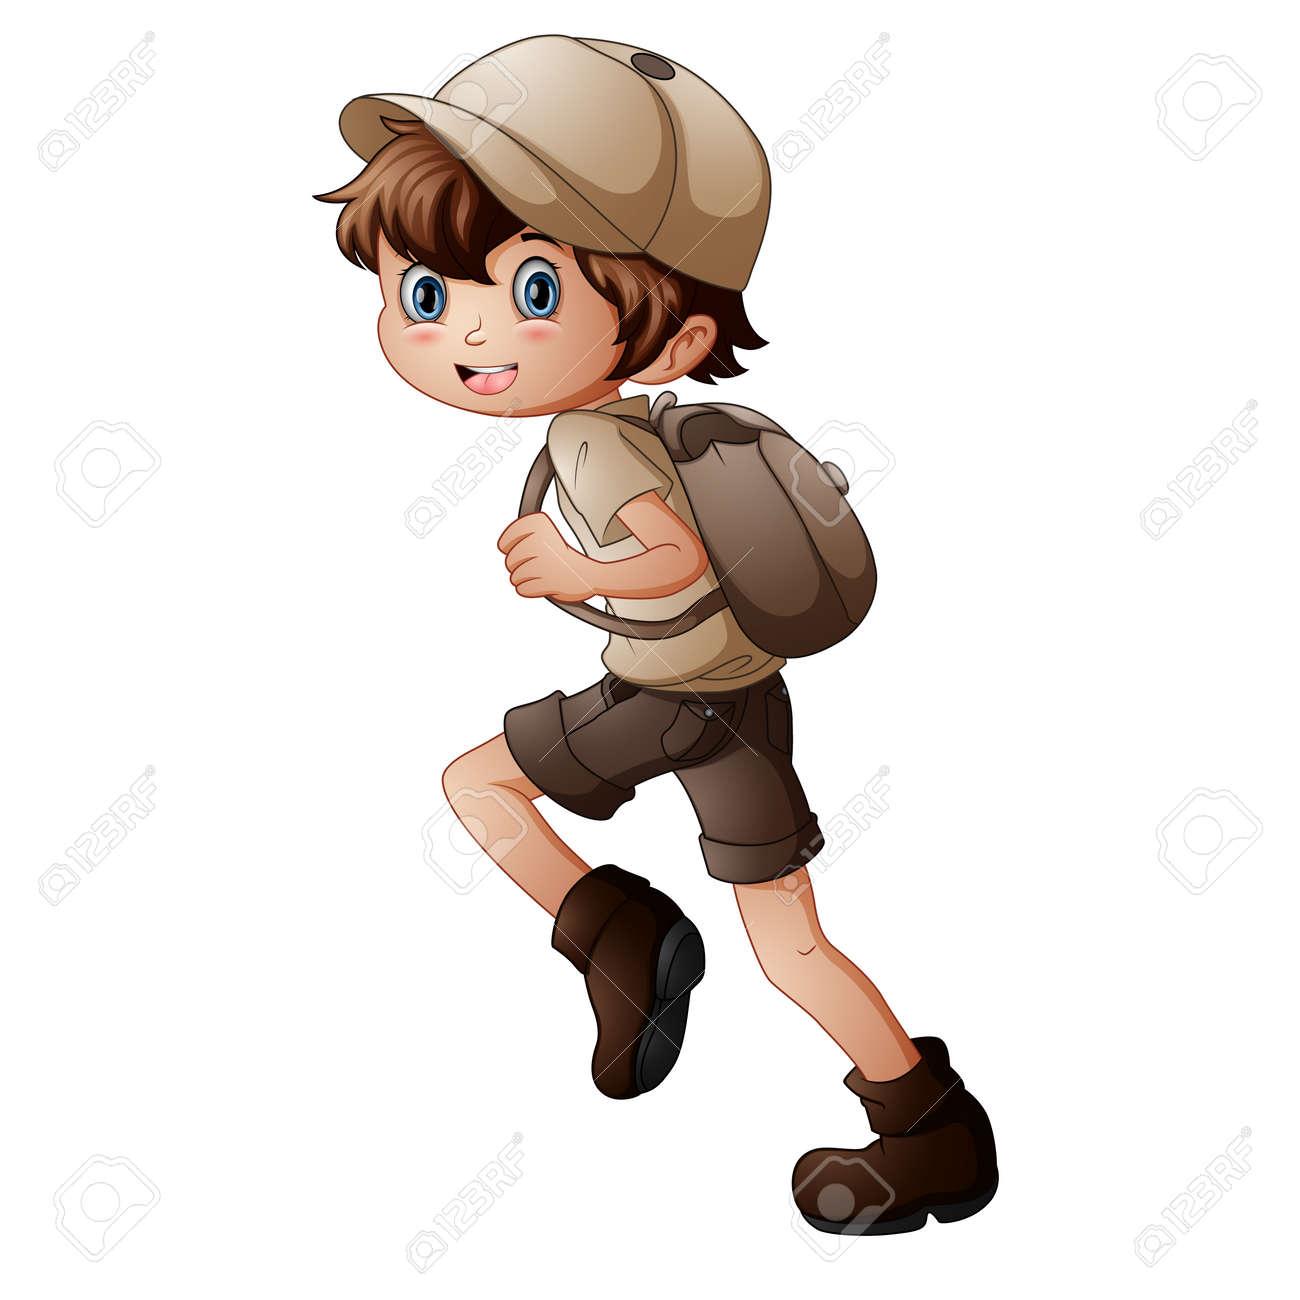 Happy scout boy running - 168266512